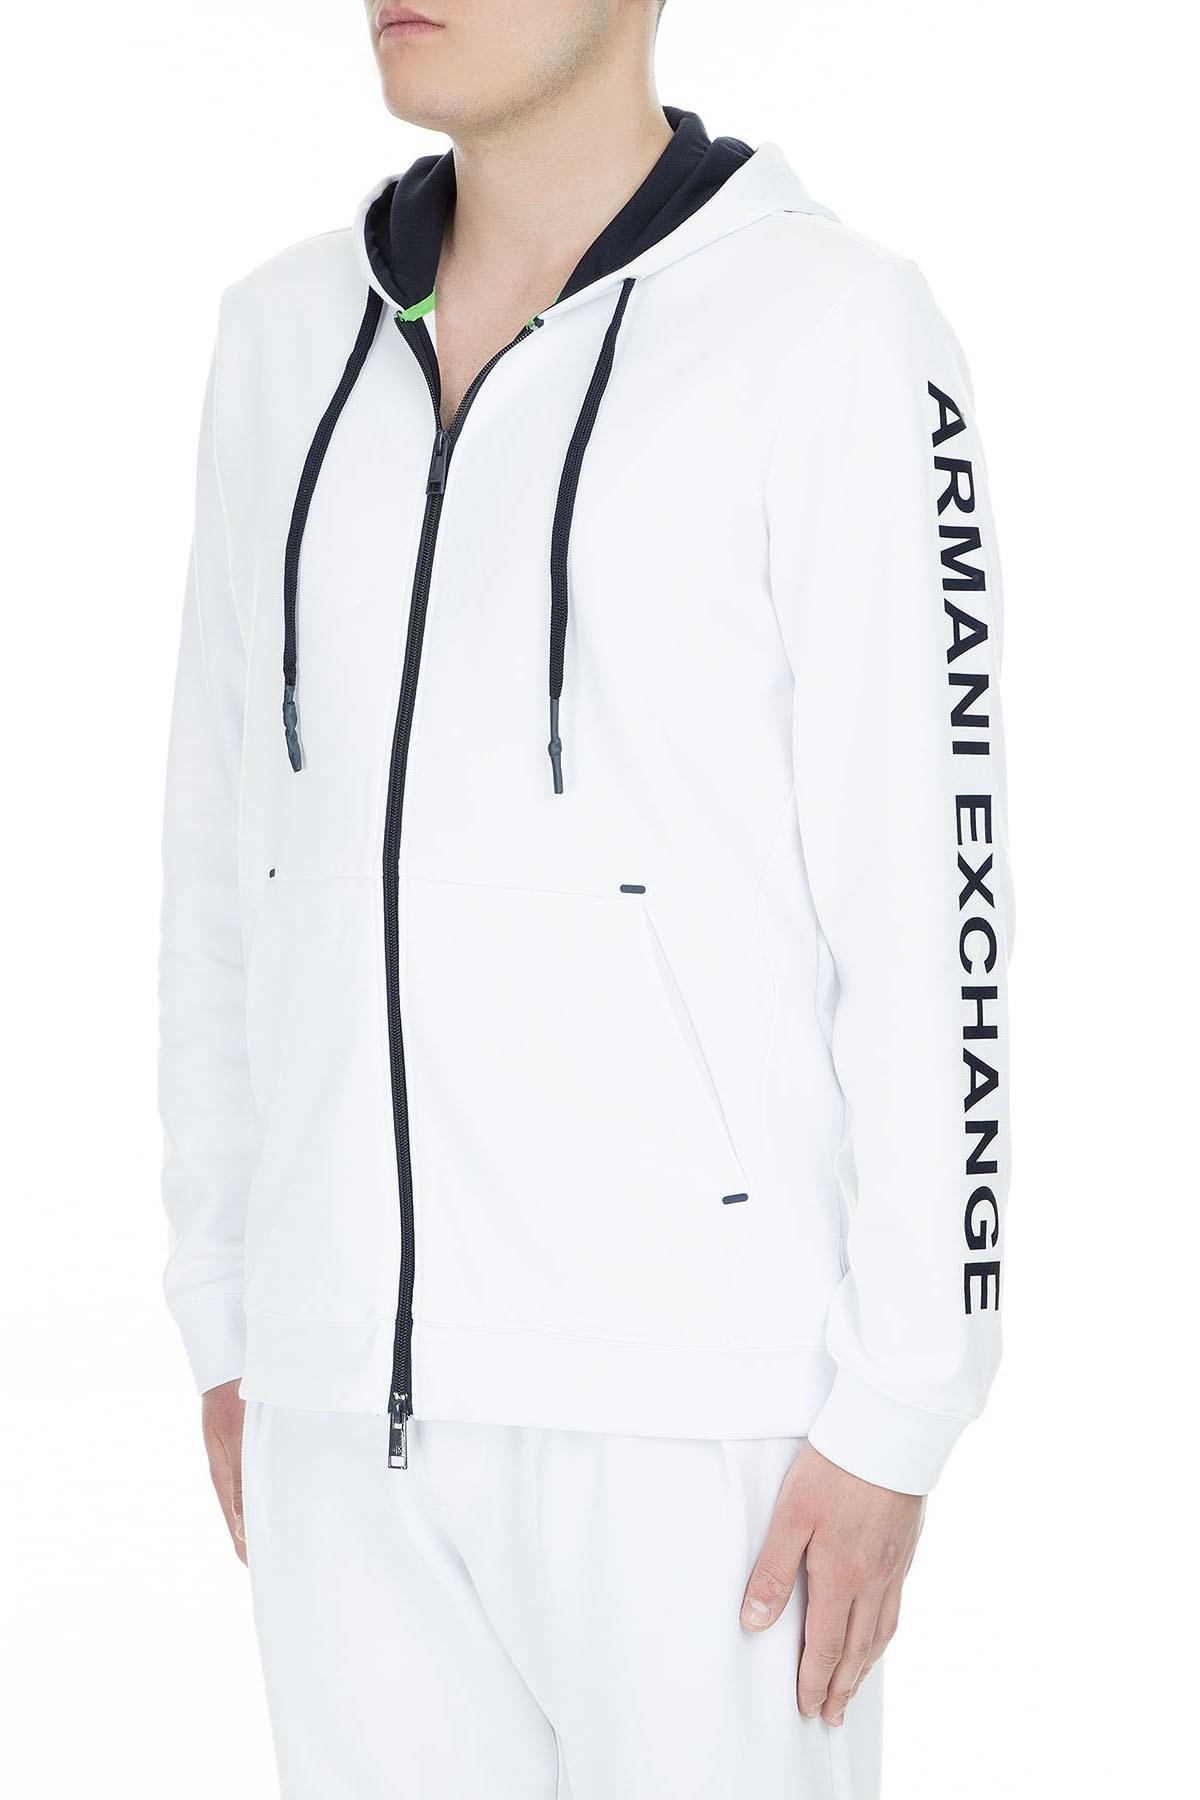 Armani Exchange Erkek Sweat 3GZM83 ZJQ2Z 1100 BEYAZ